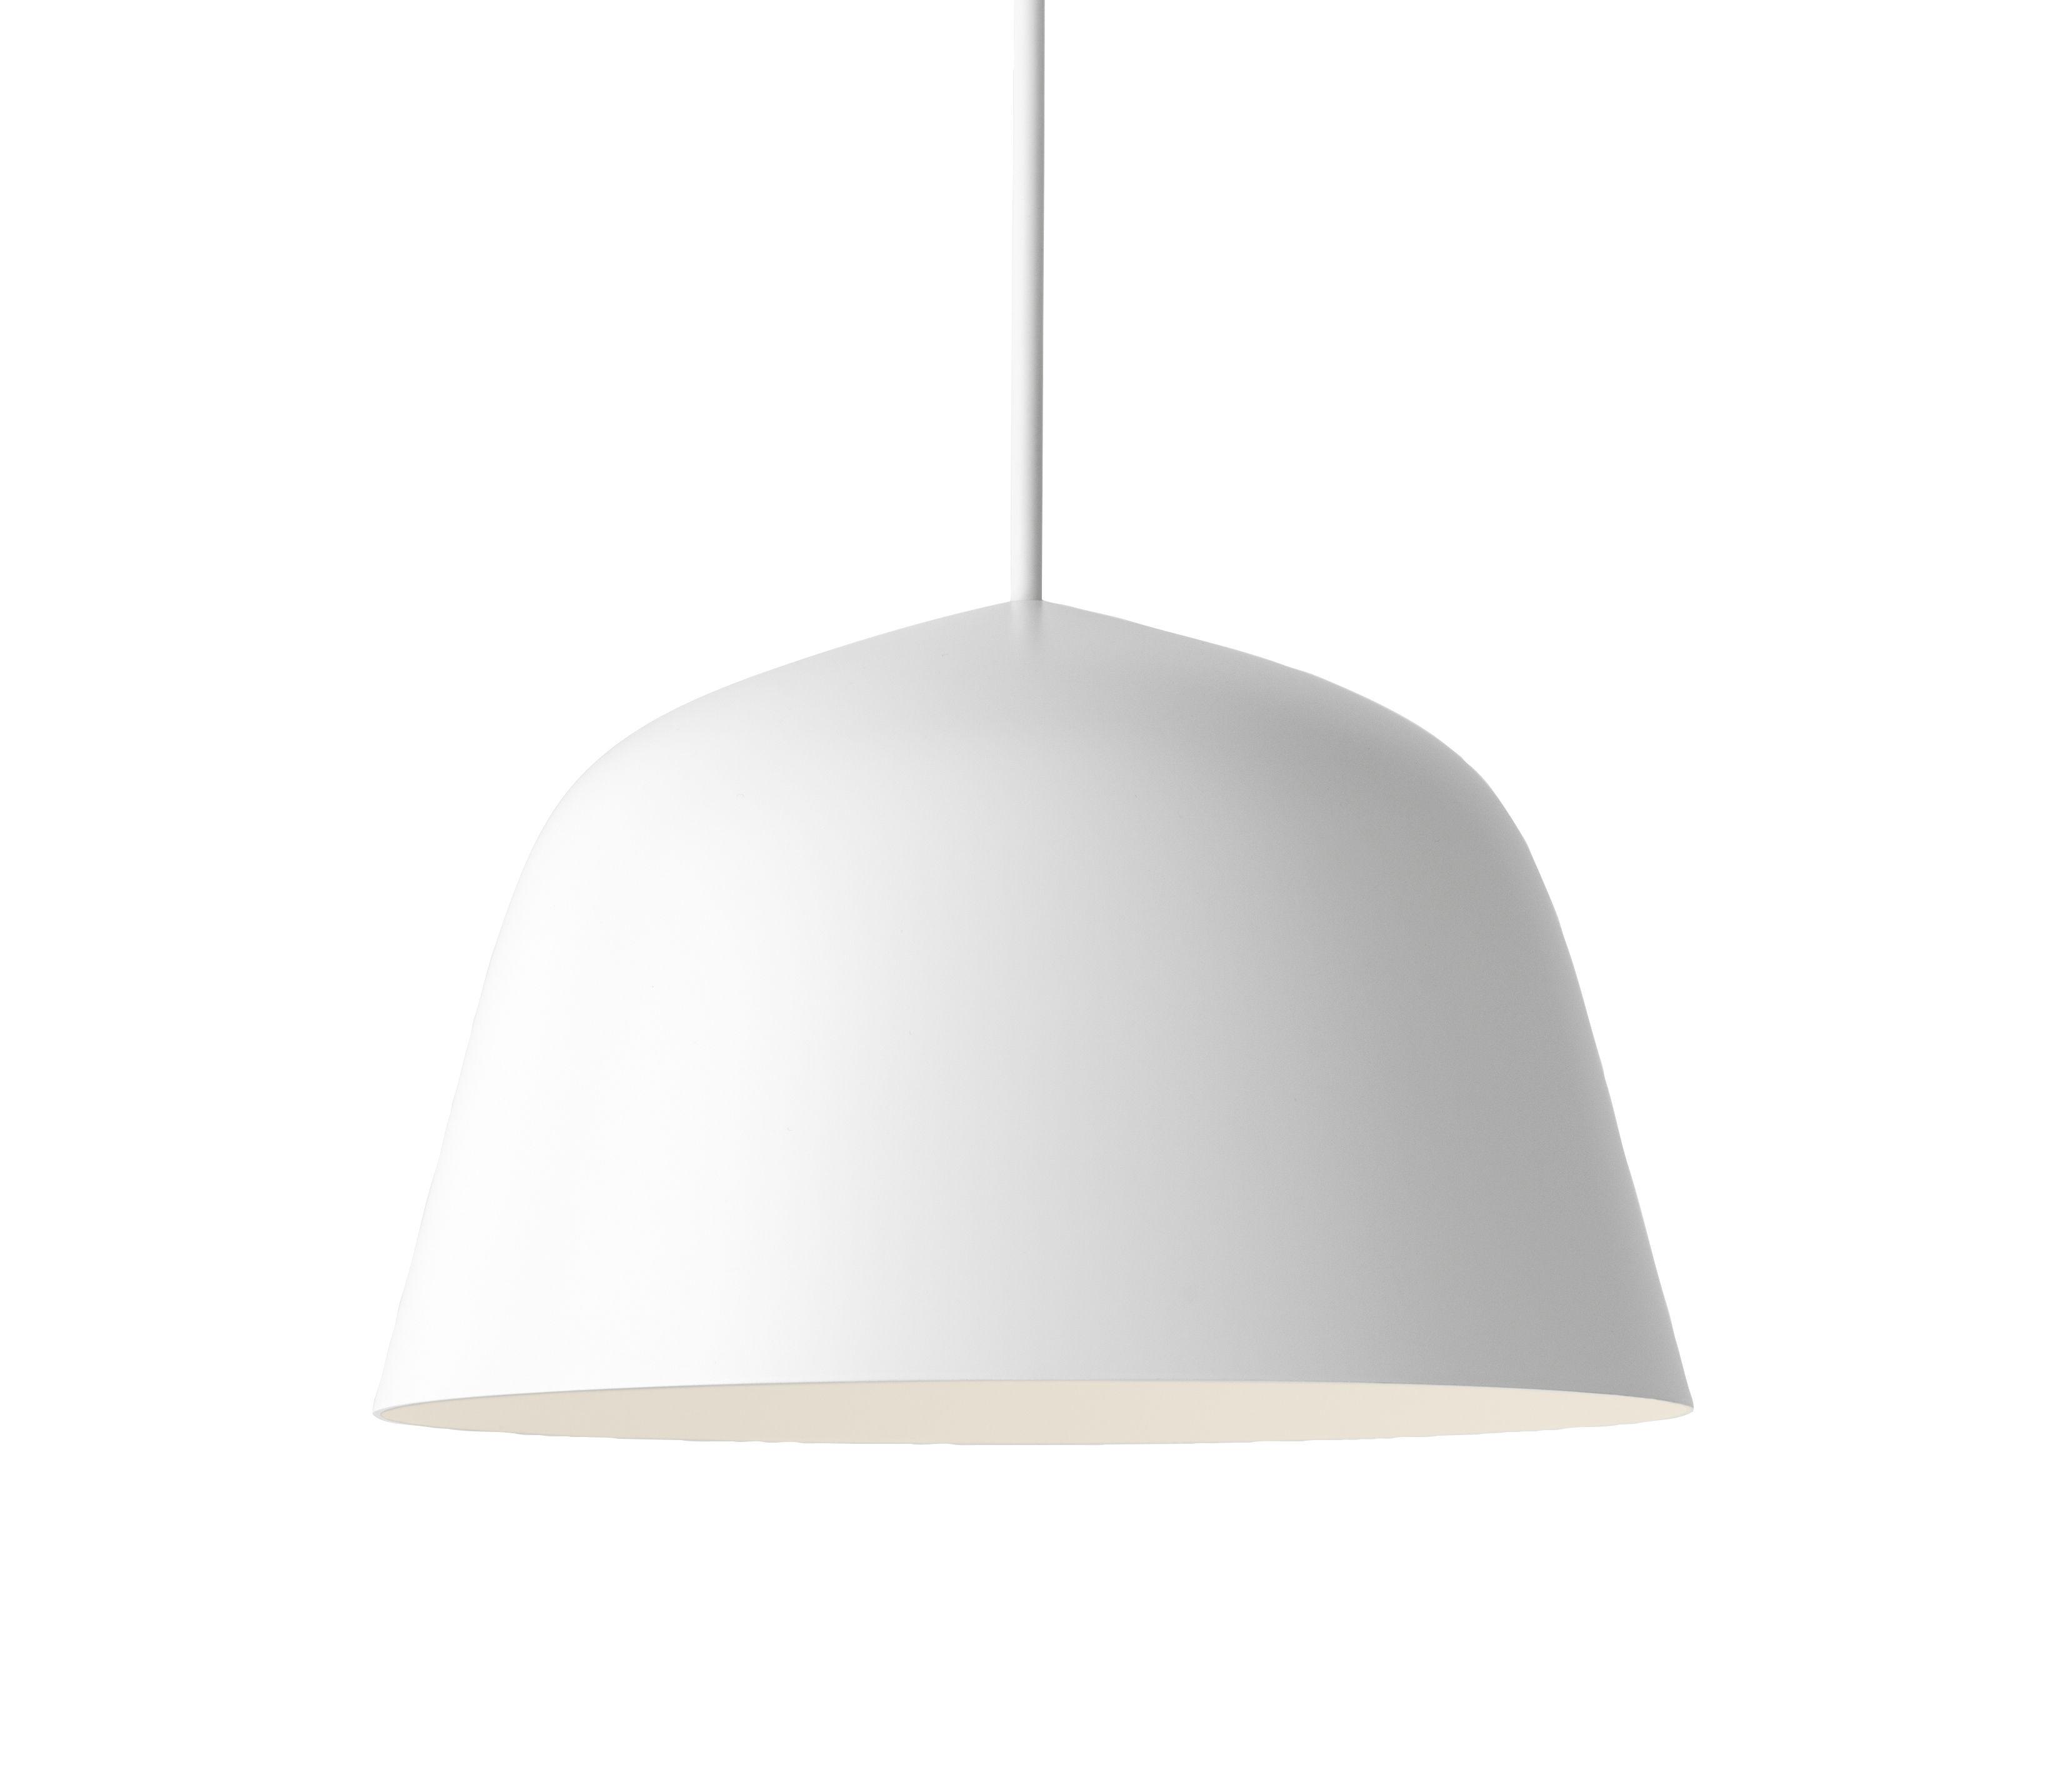 Lighting - Pendant Lighting - Ambit Pendant - Ø 25 cm by Muuto - White - Aluminium